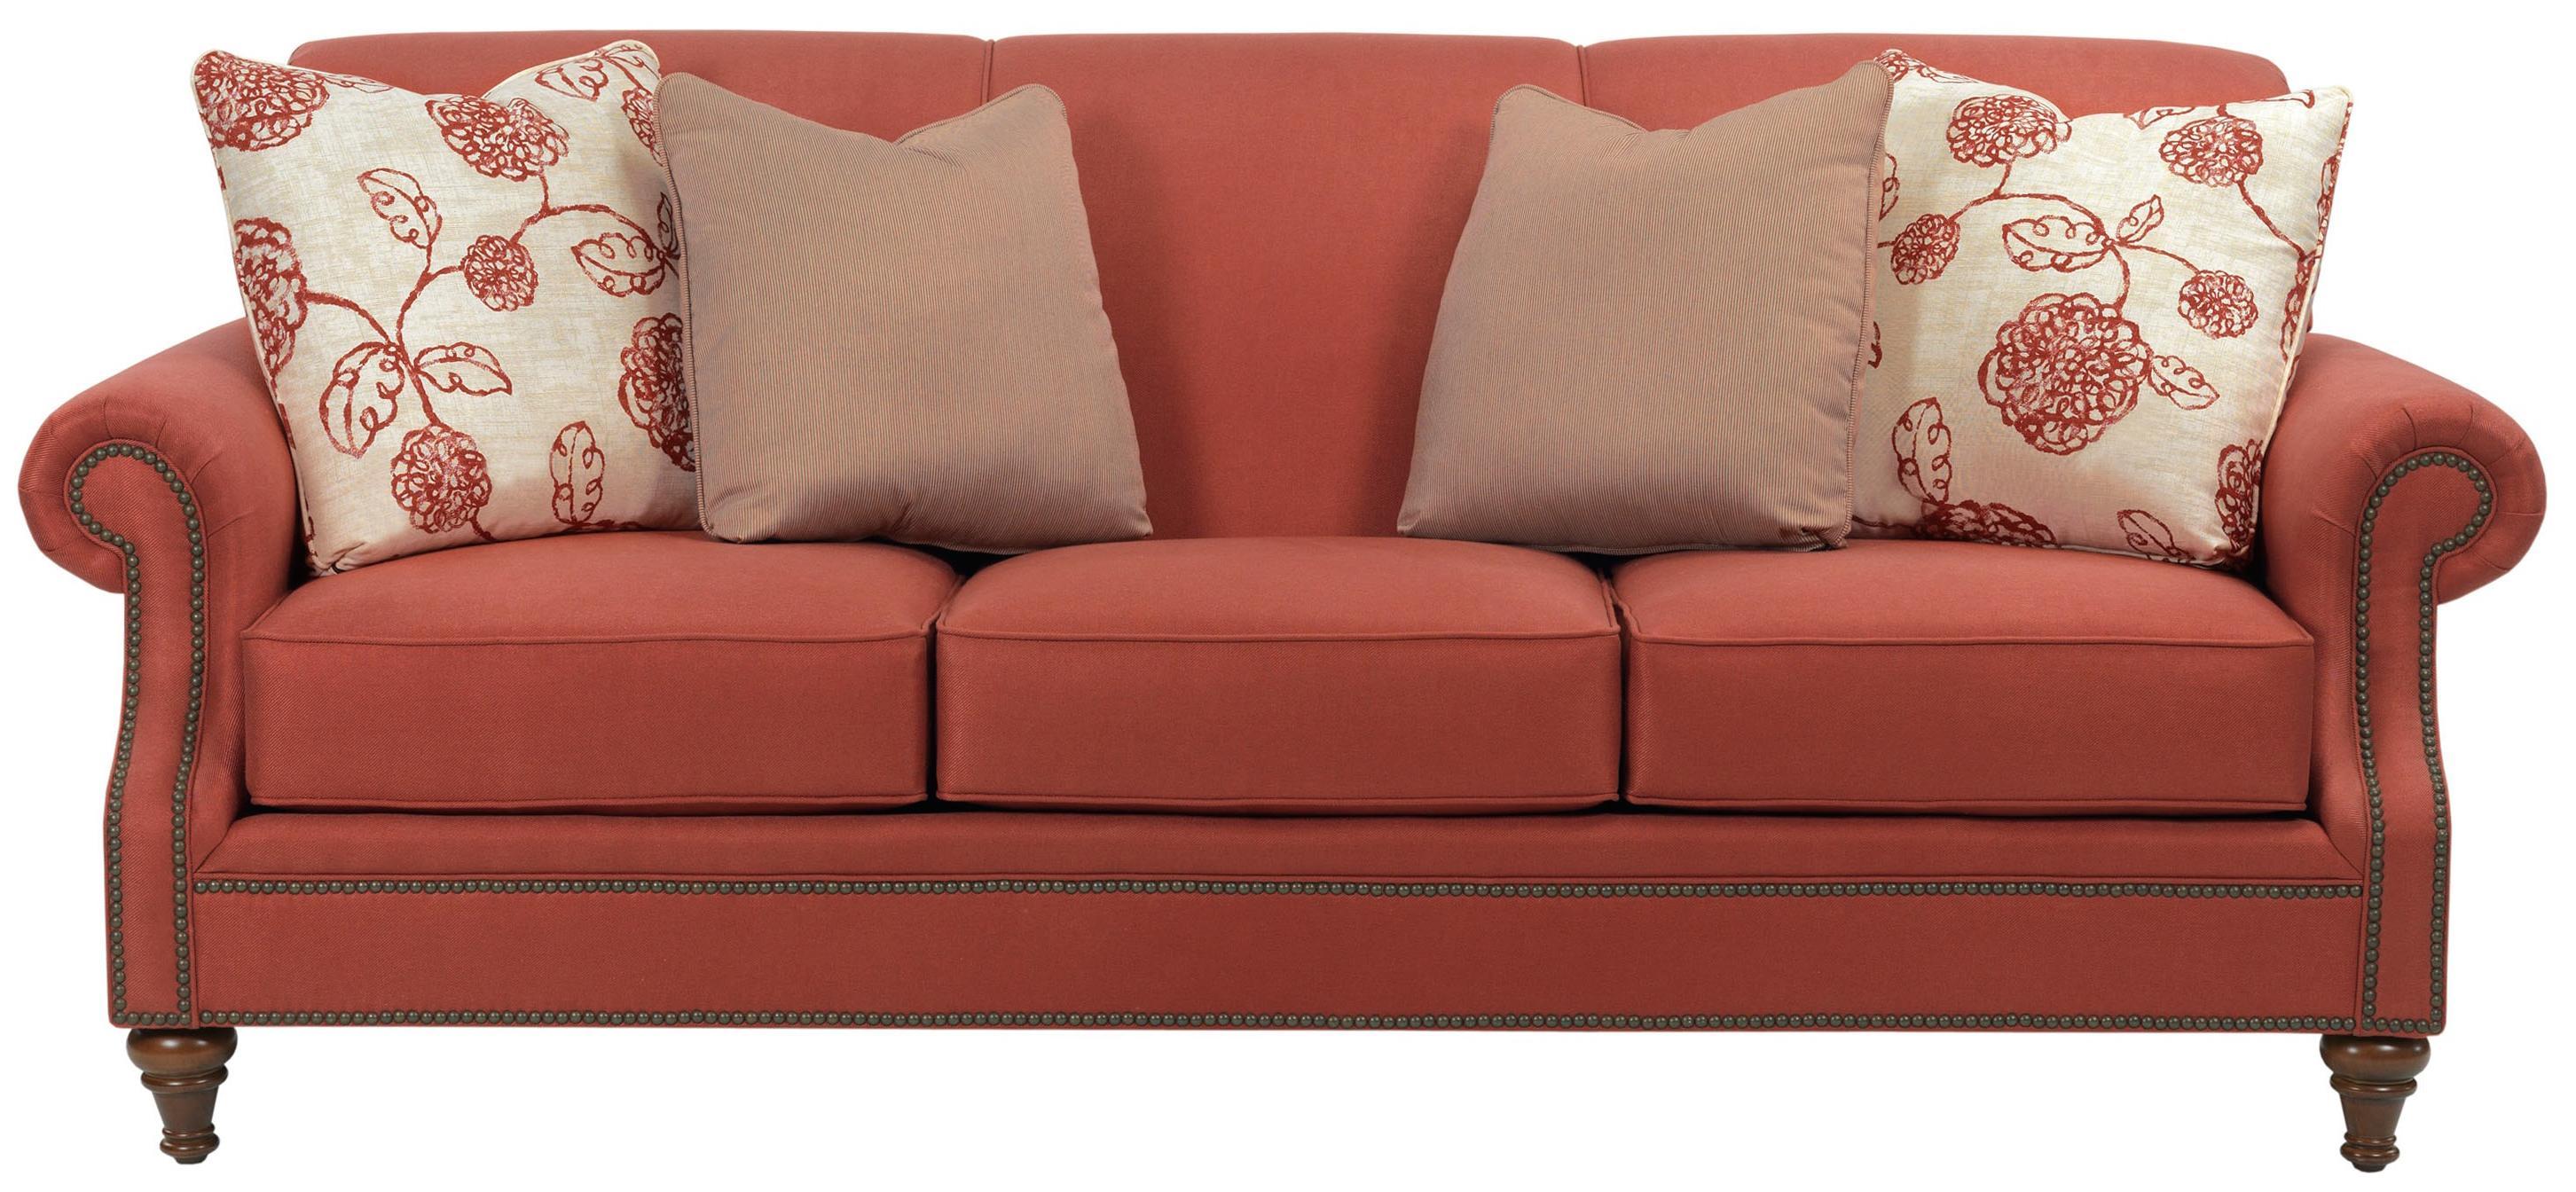 Broyhill Furniture Windsor Sofa - Item Number: 4250-3-4097-64